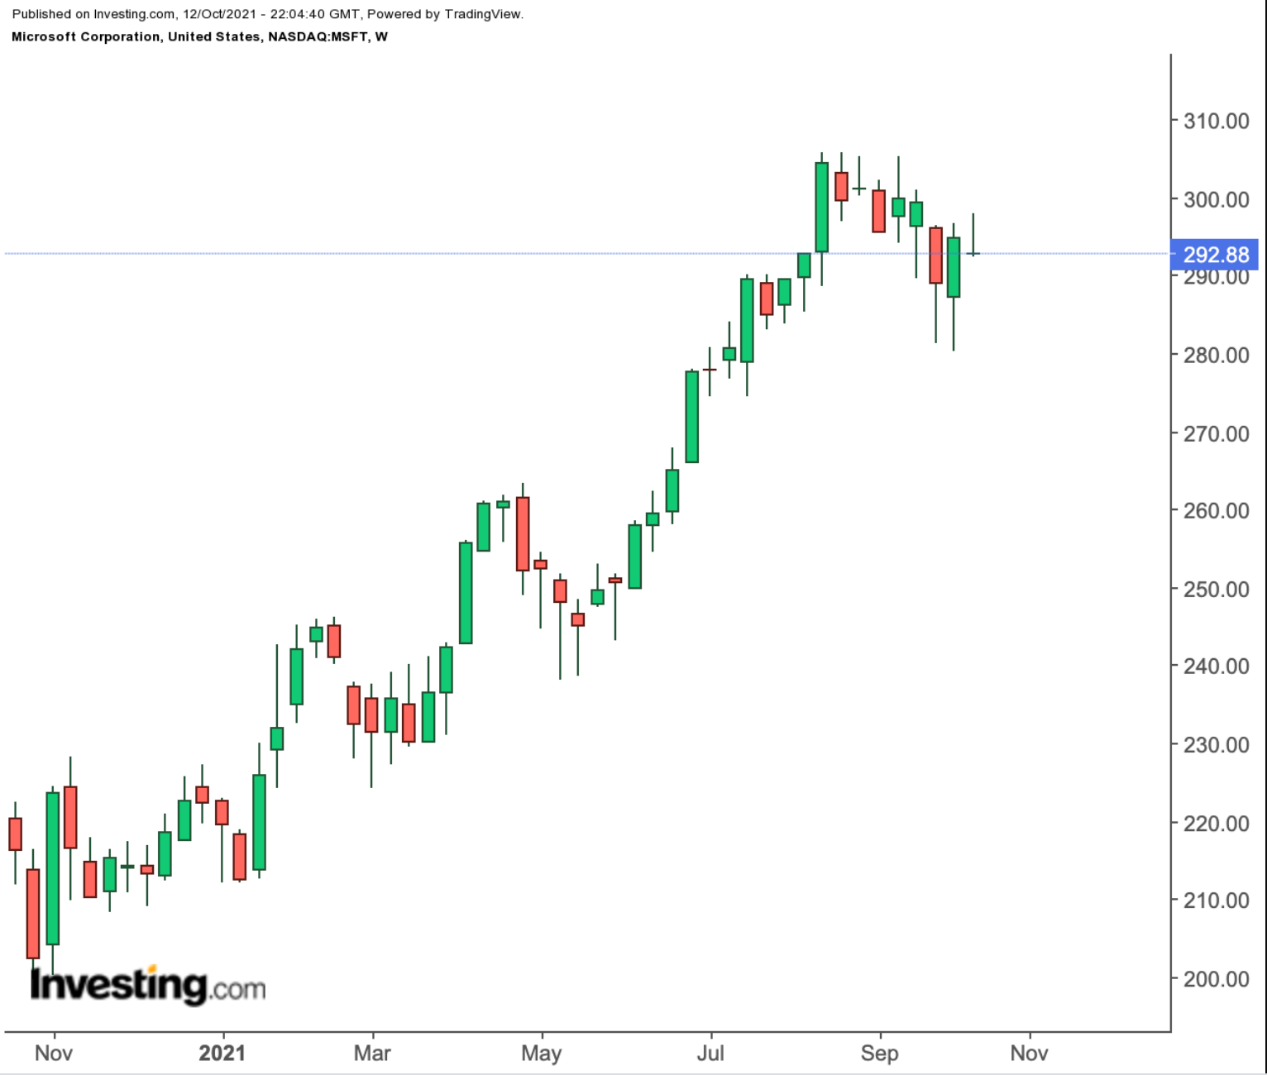 微軟周線圖,來源:Investing.com